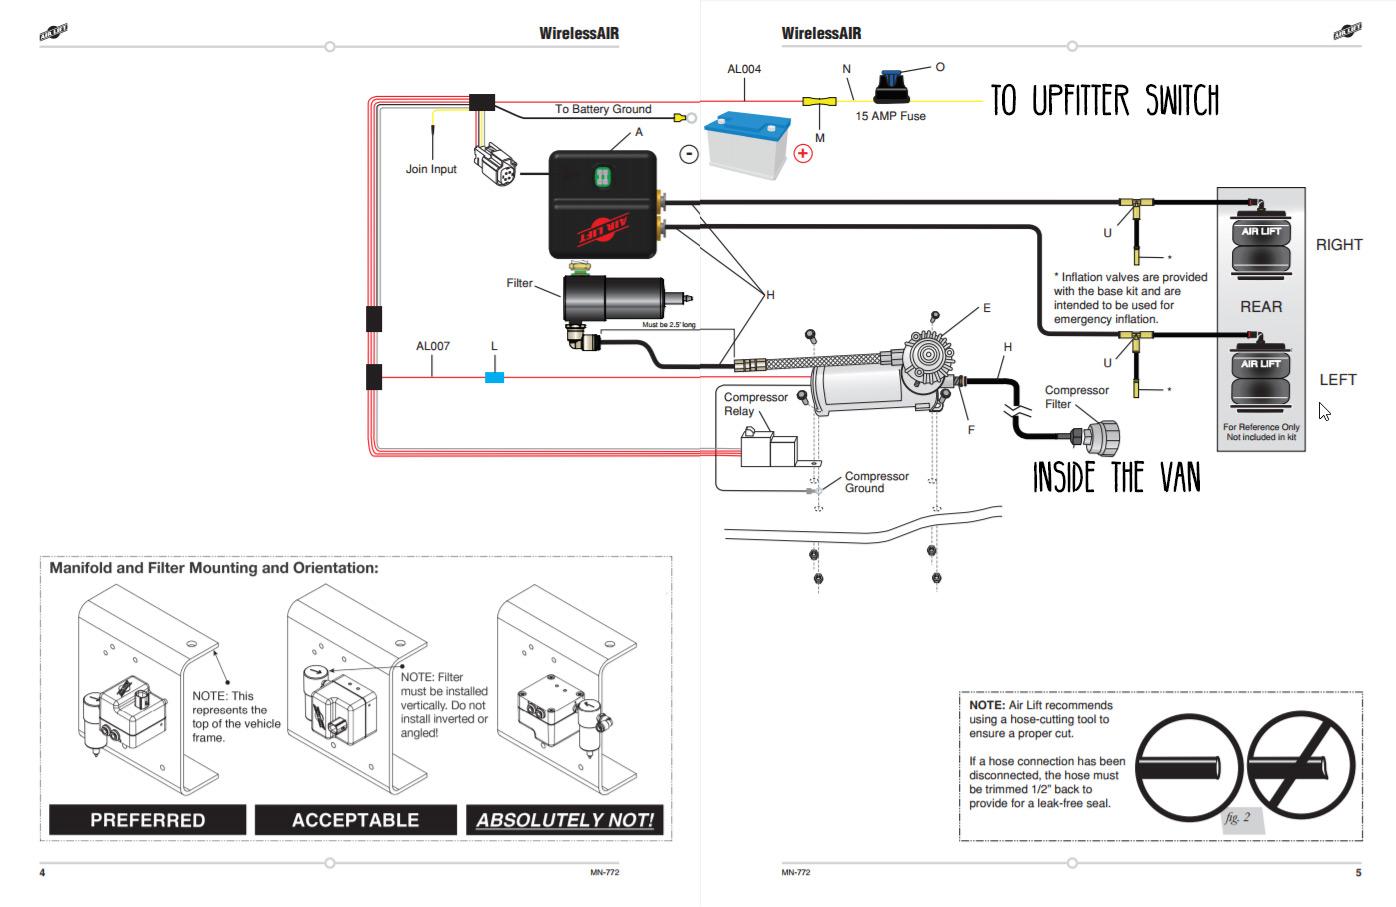 air lift wiring diagram electrical diagrams forum u2022 rh jimmellon co uk